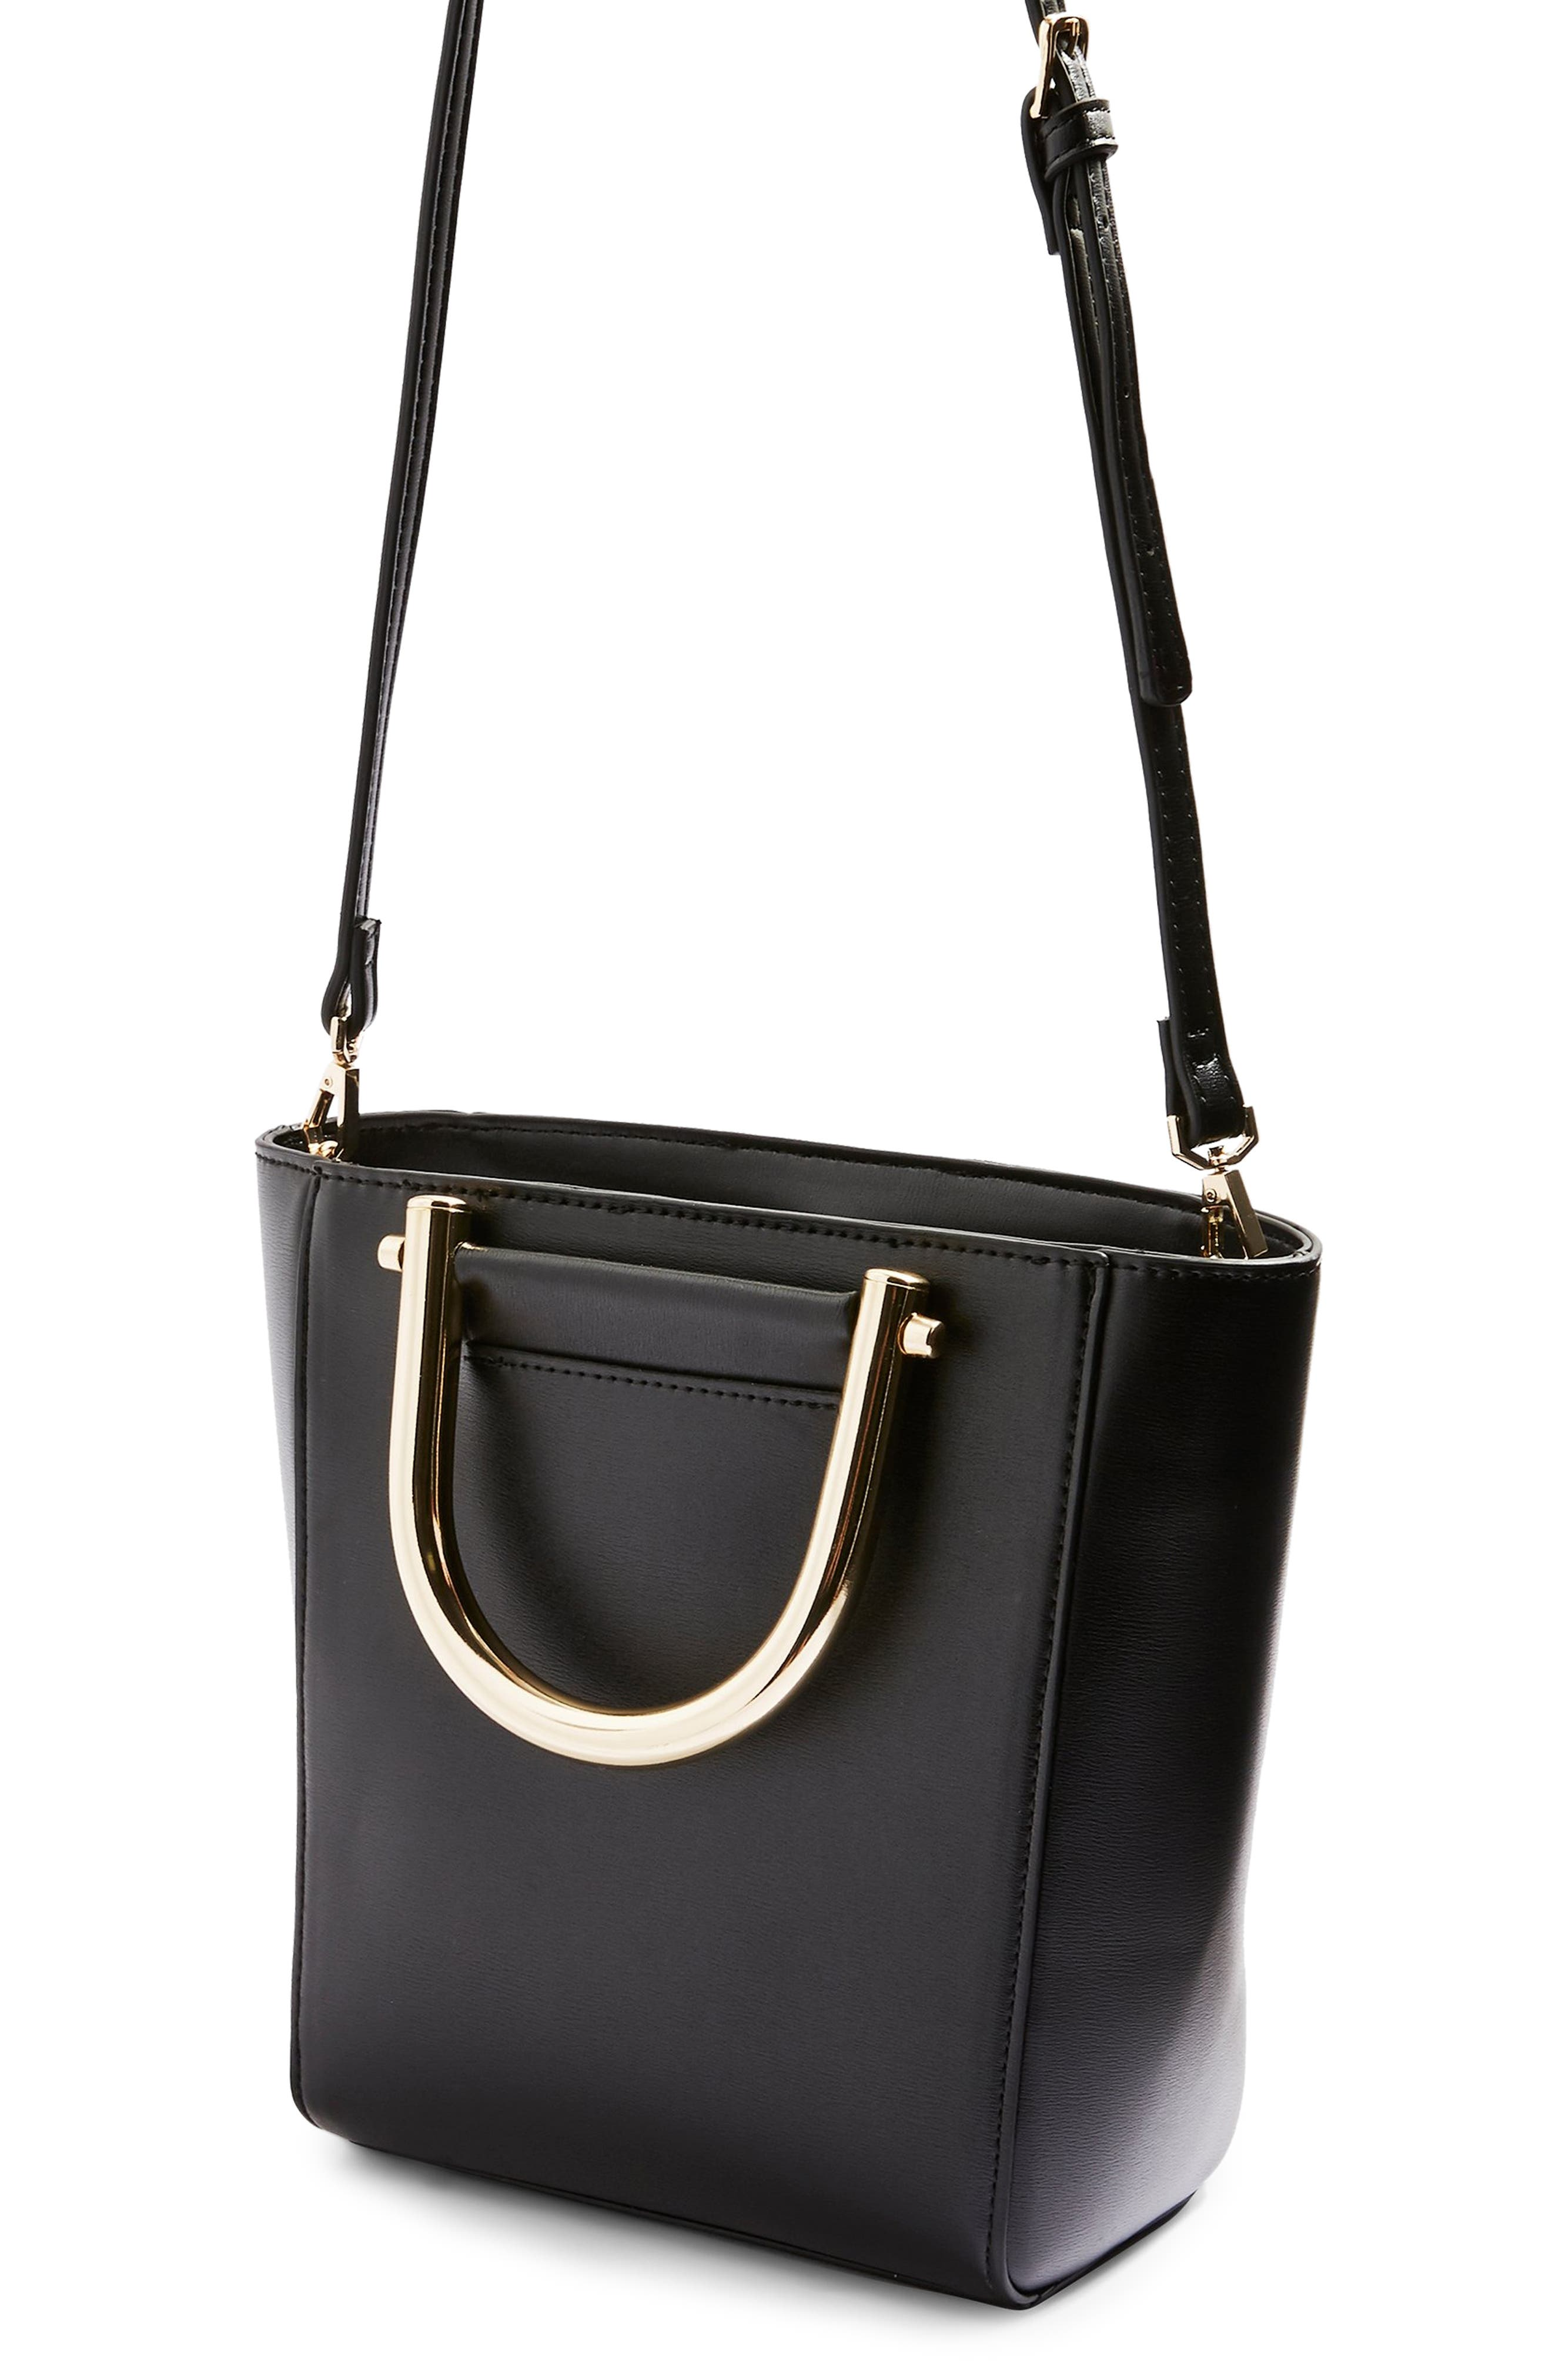 TOPSHOP,                             Lacey Metal Top Handle Shoulder Bag,                             Alternate thumbnail 3, color,                             001